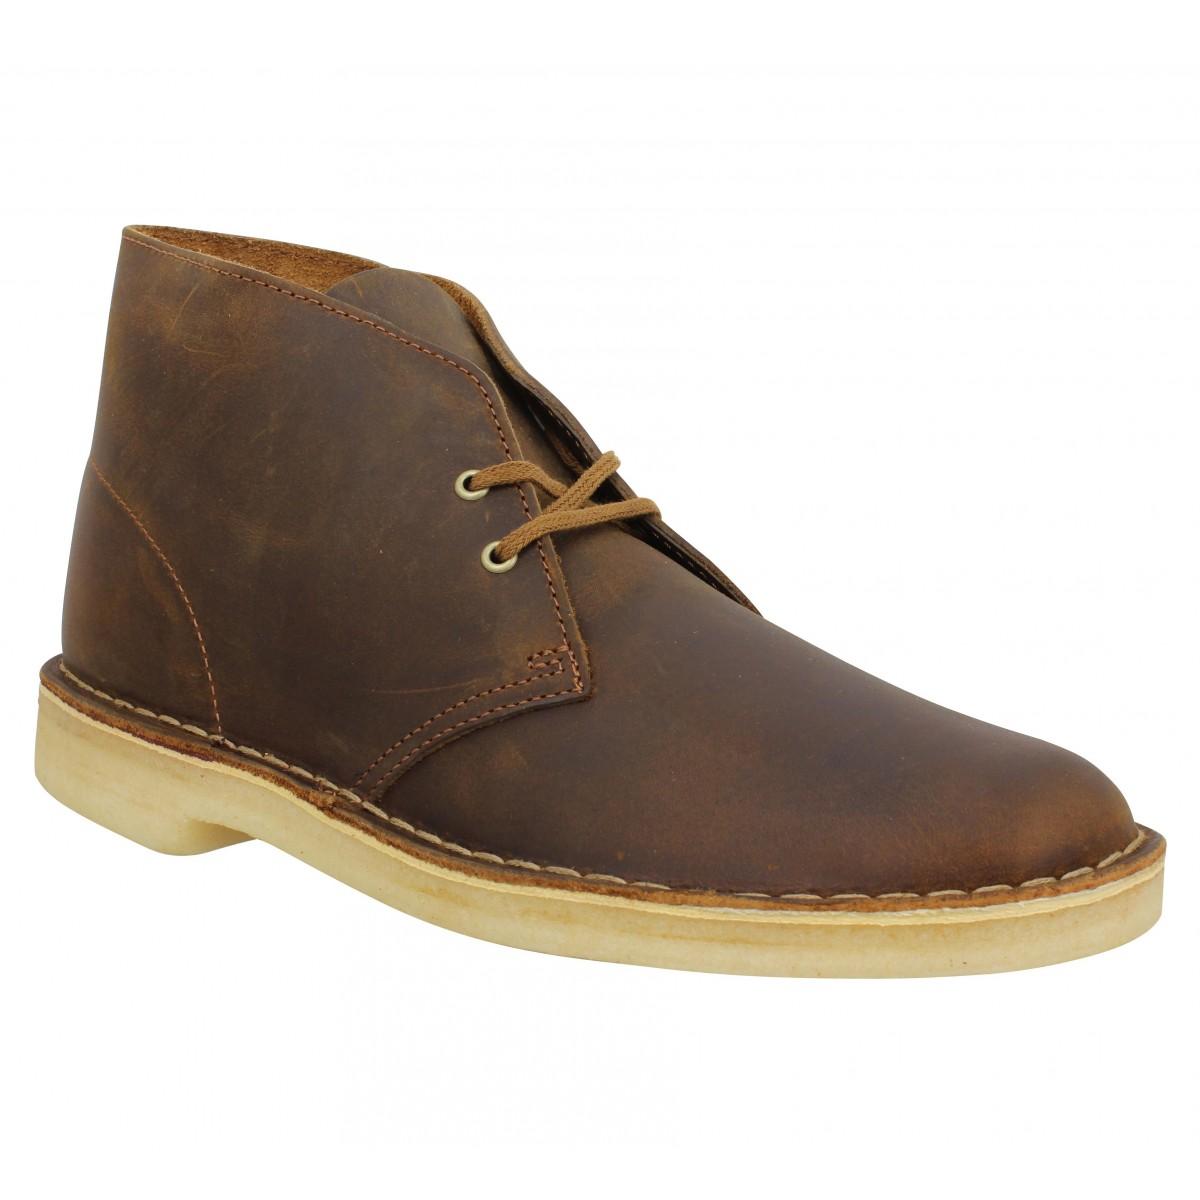 Clarks Originals Marque Desert Boot Cuir...